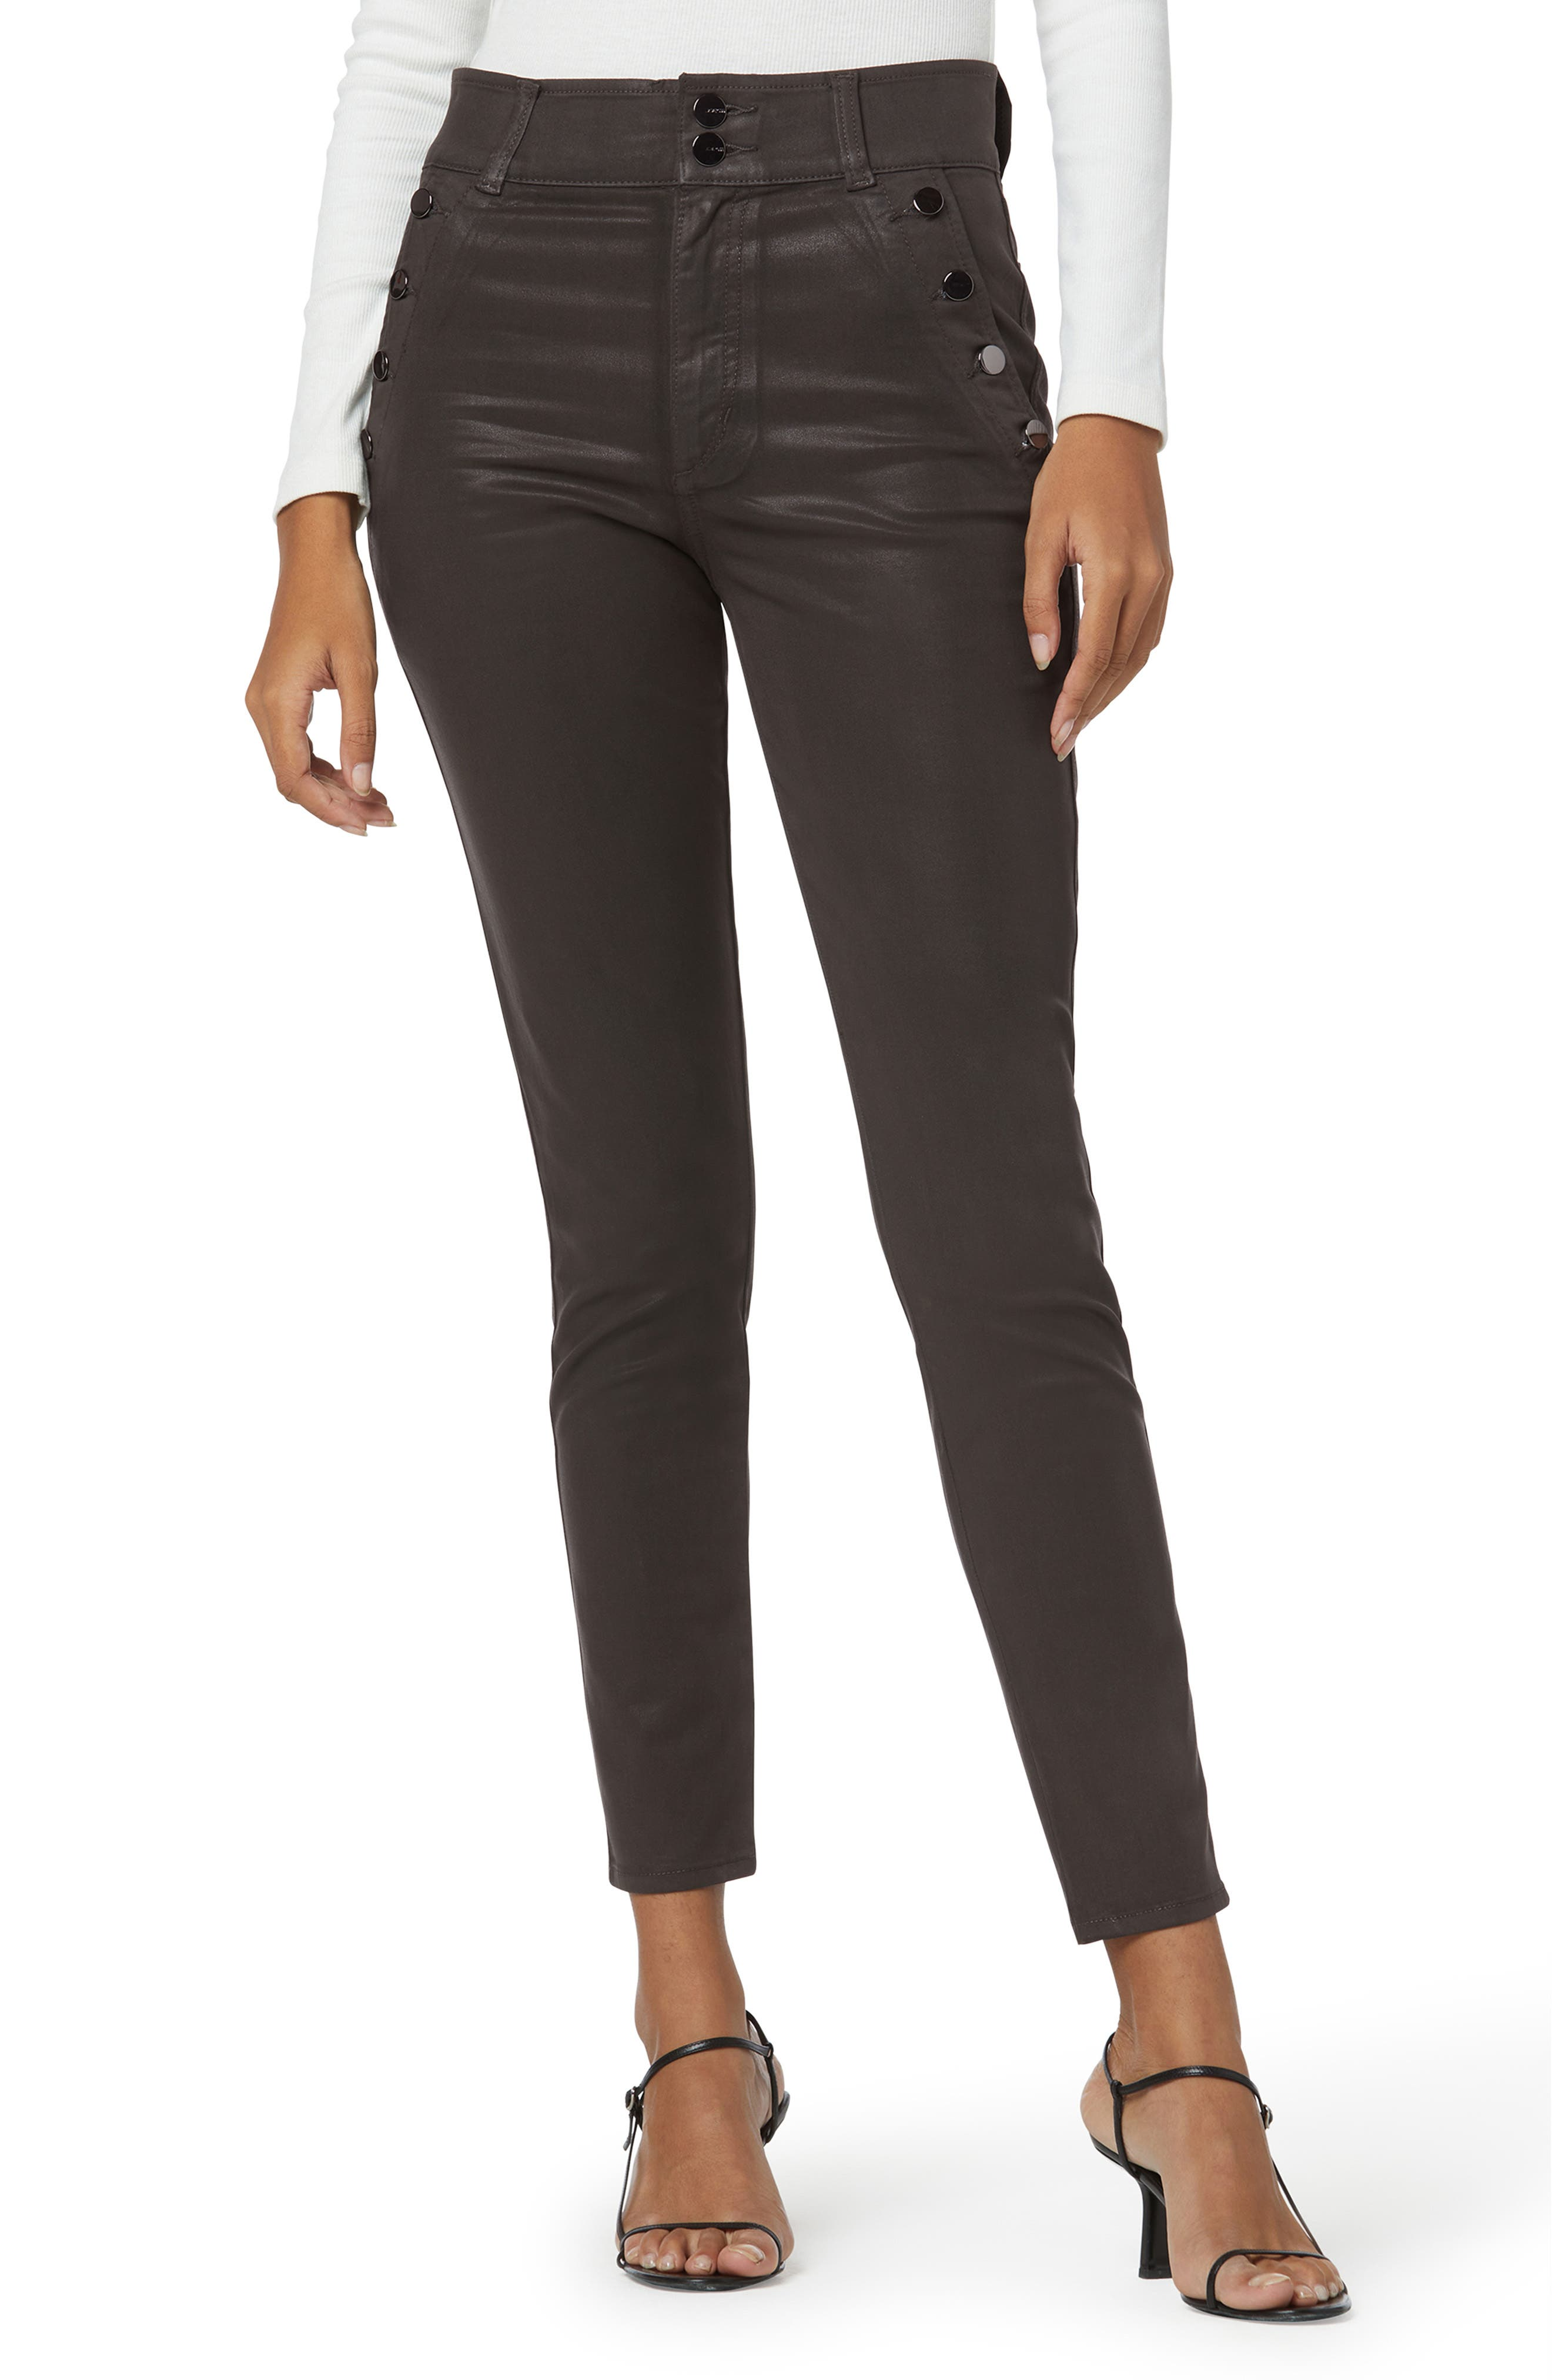 The Georgia Coated High Waist Ankle Skinny Jeans